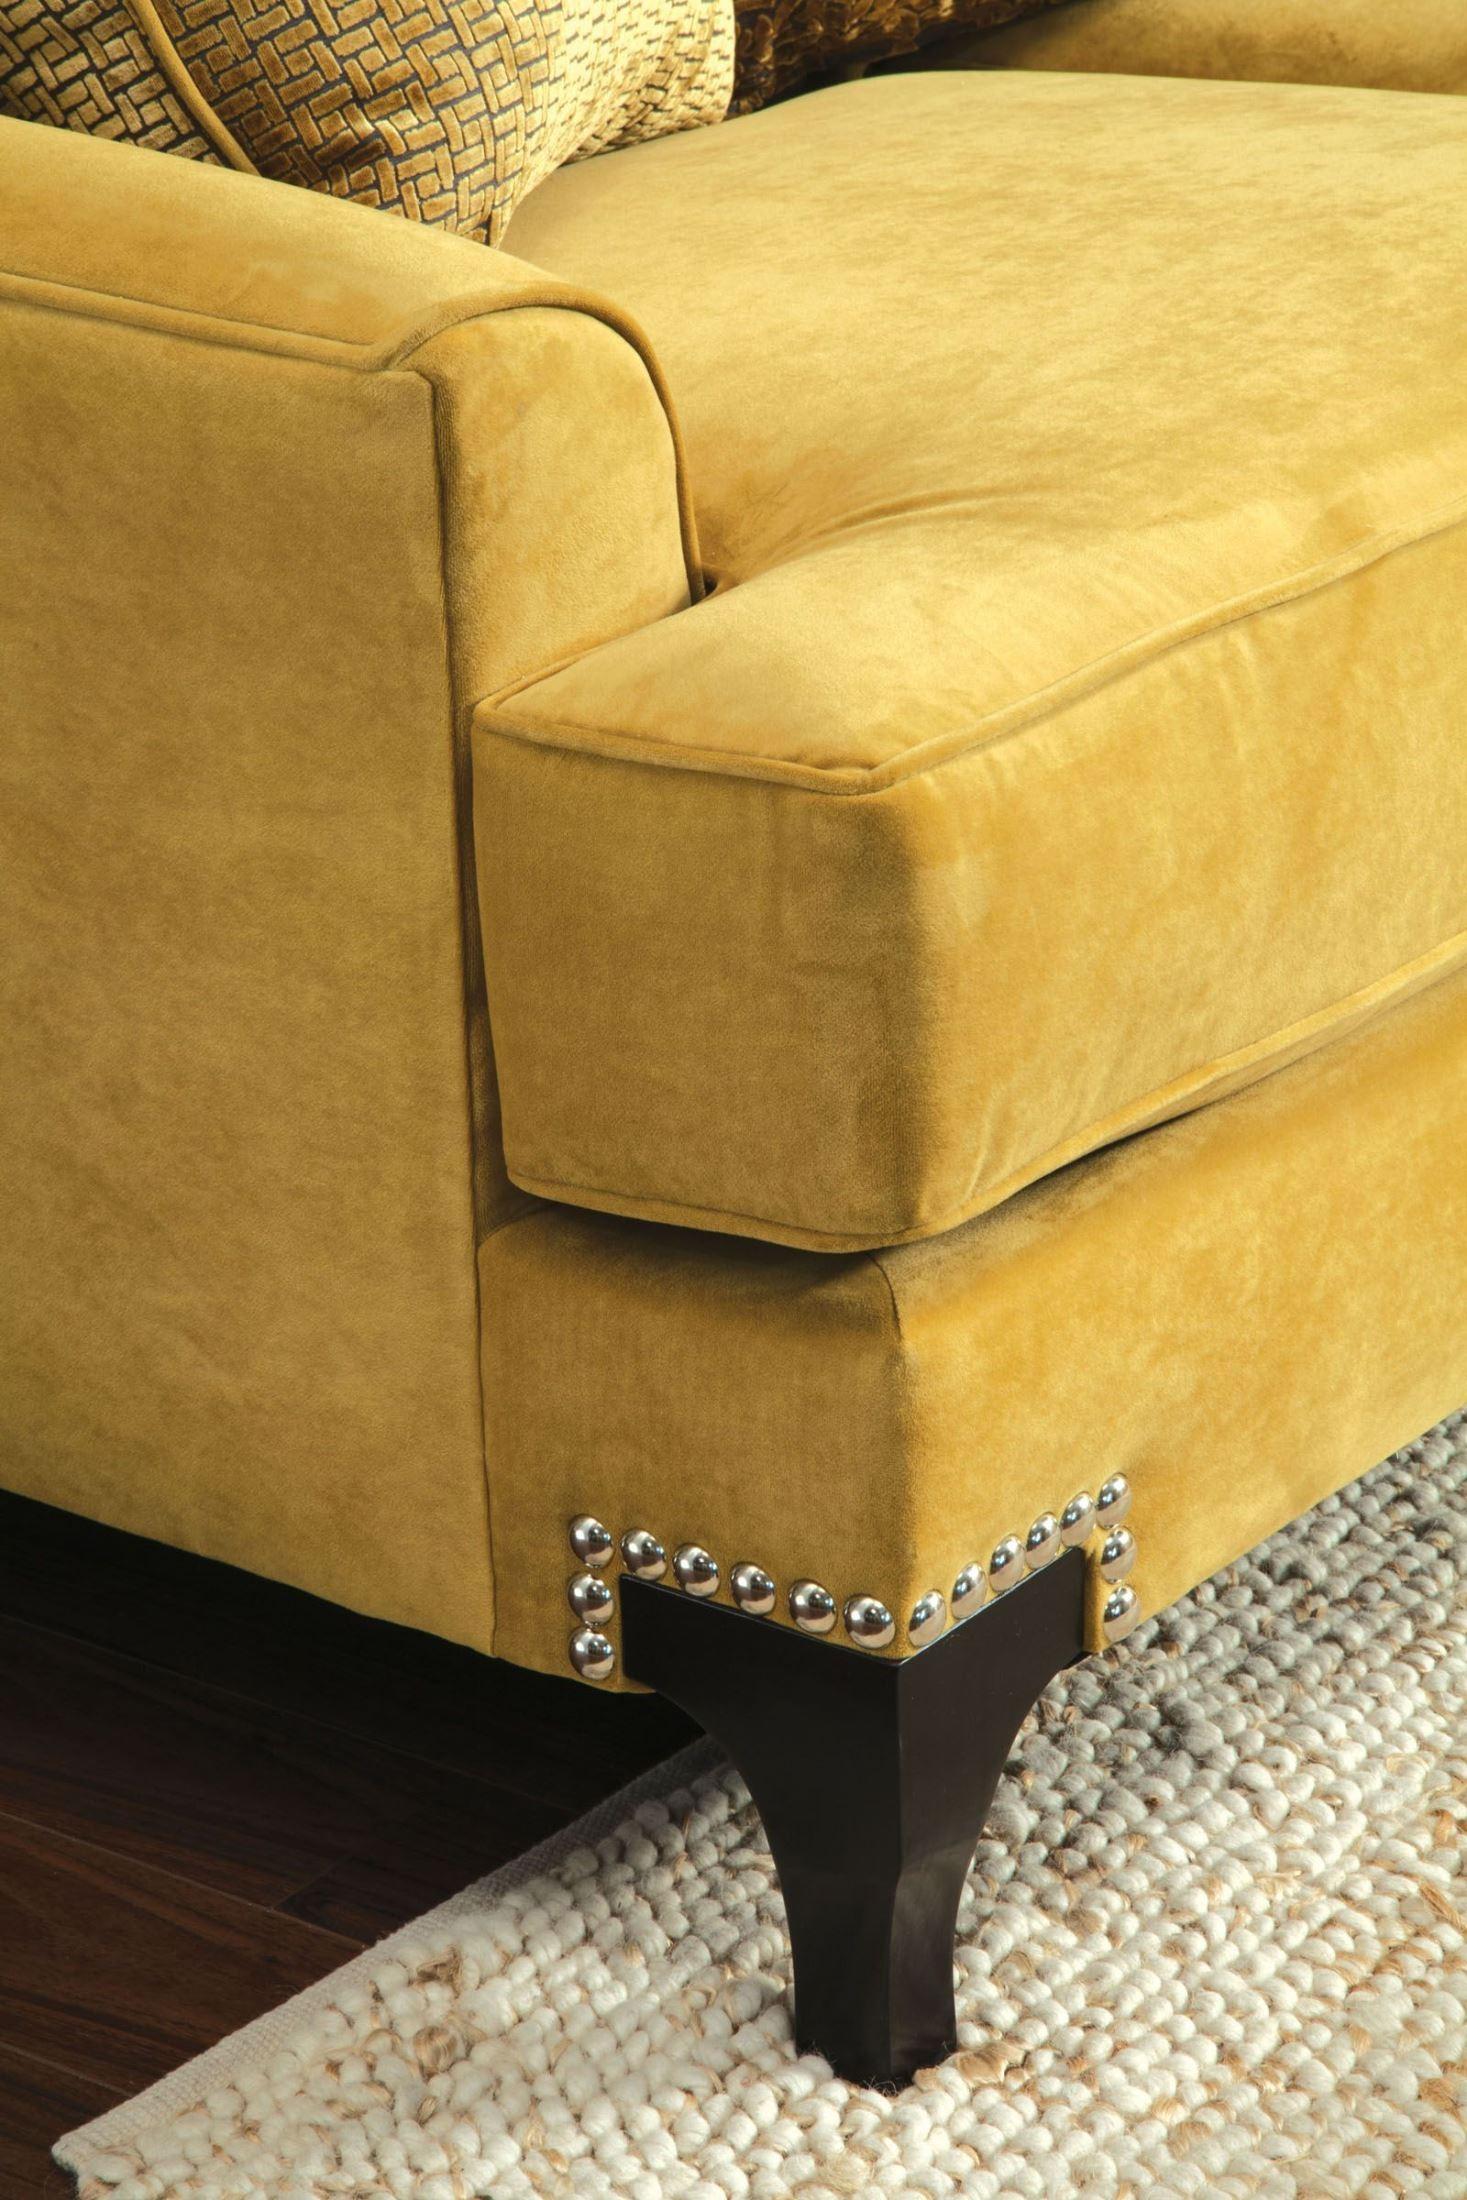 Viscontti Gold Sofa From Furniture Of America Sm2201 Sf Coleman Furniture